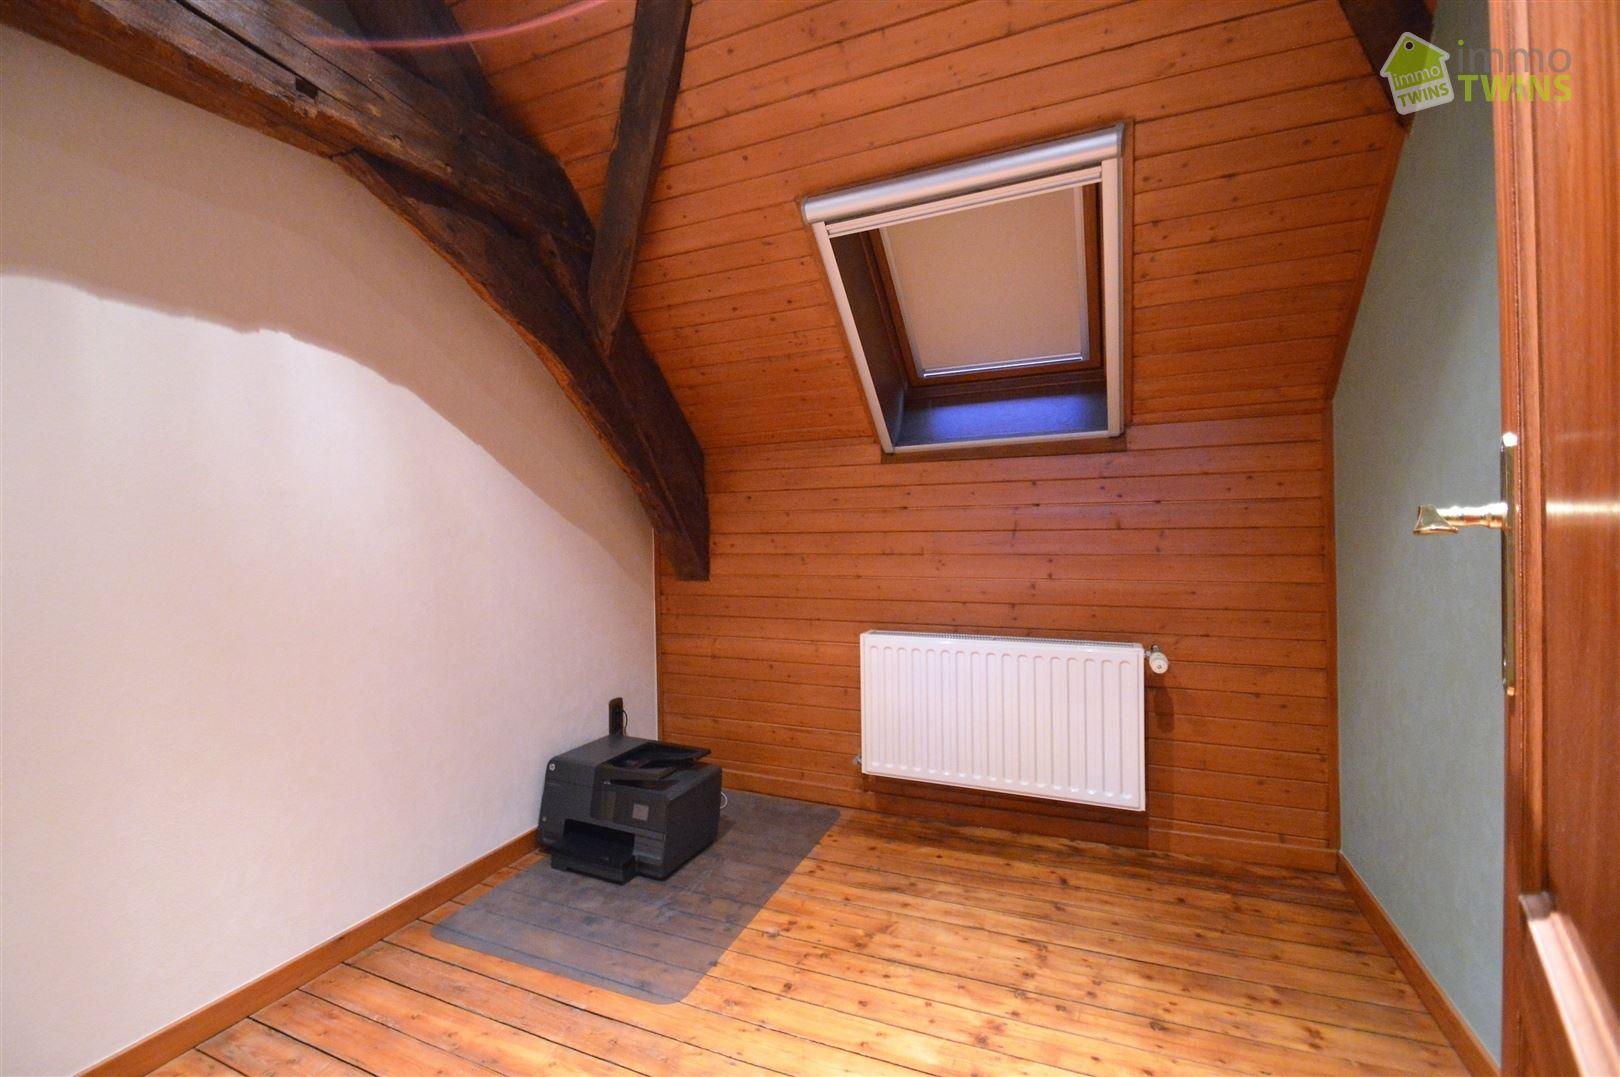 Foto 21 : Duplex/Penthouse te 2890 SINT-AMANDS (België) - Prijs € 449.000